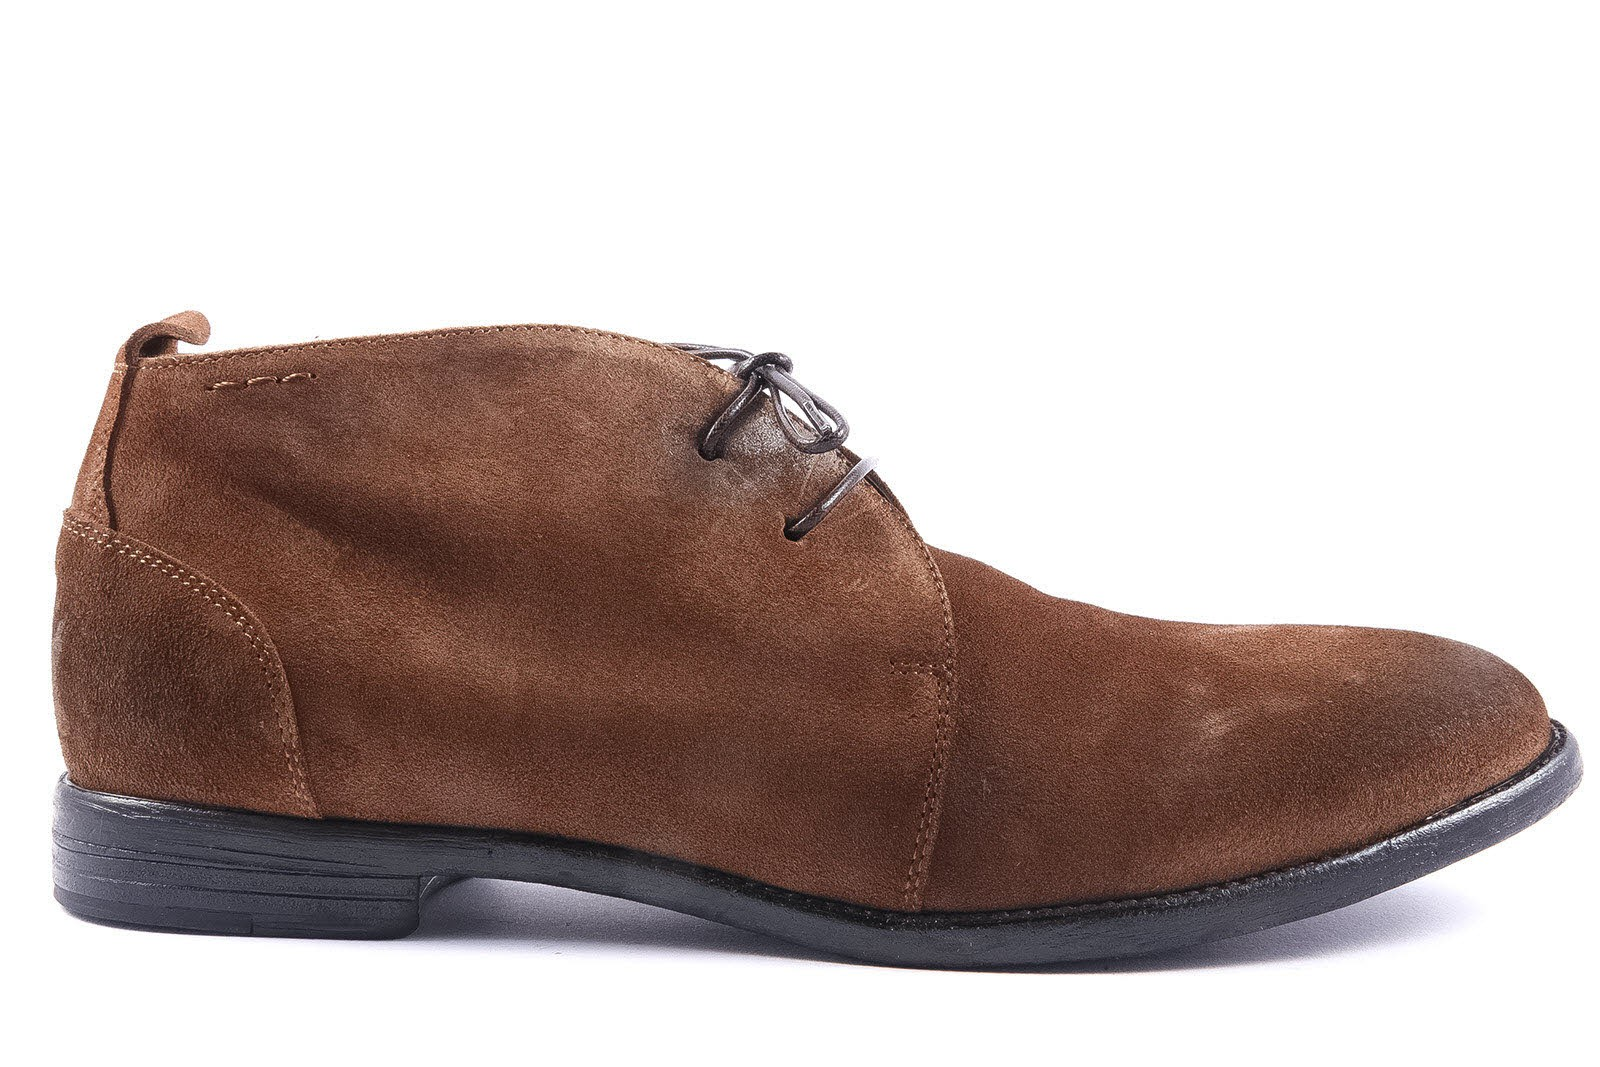 Alexander Hotto Shoes Sale